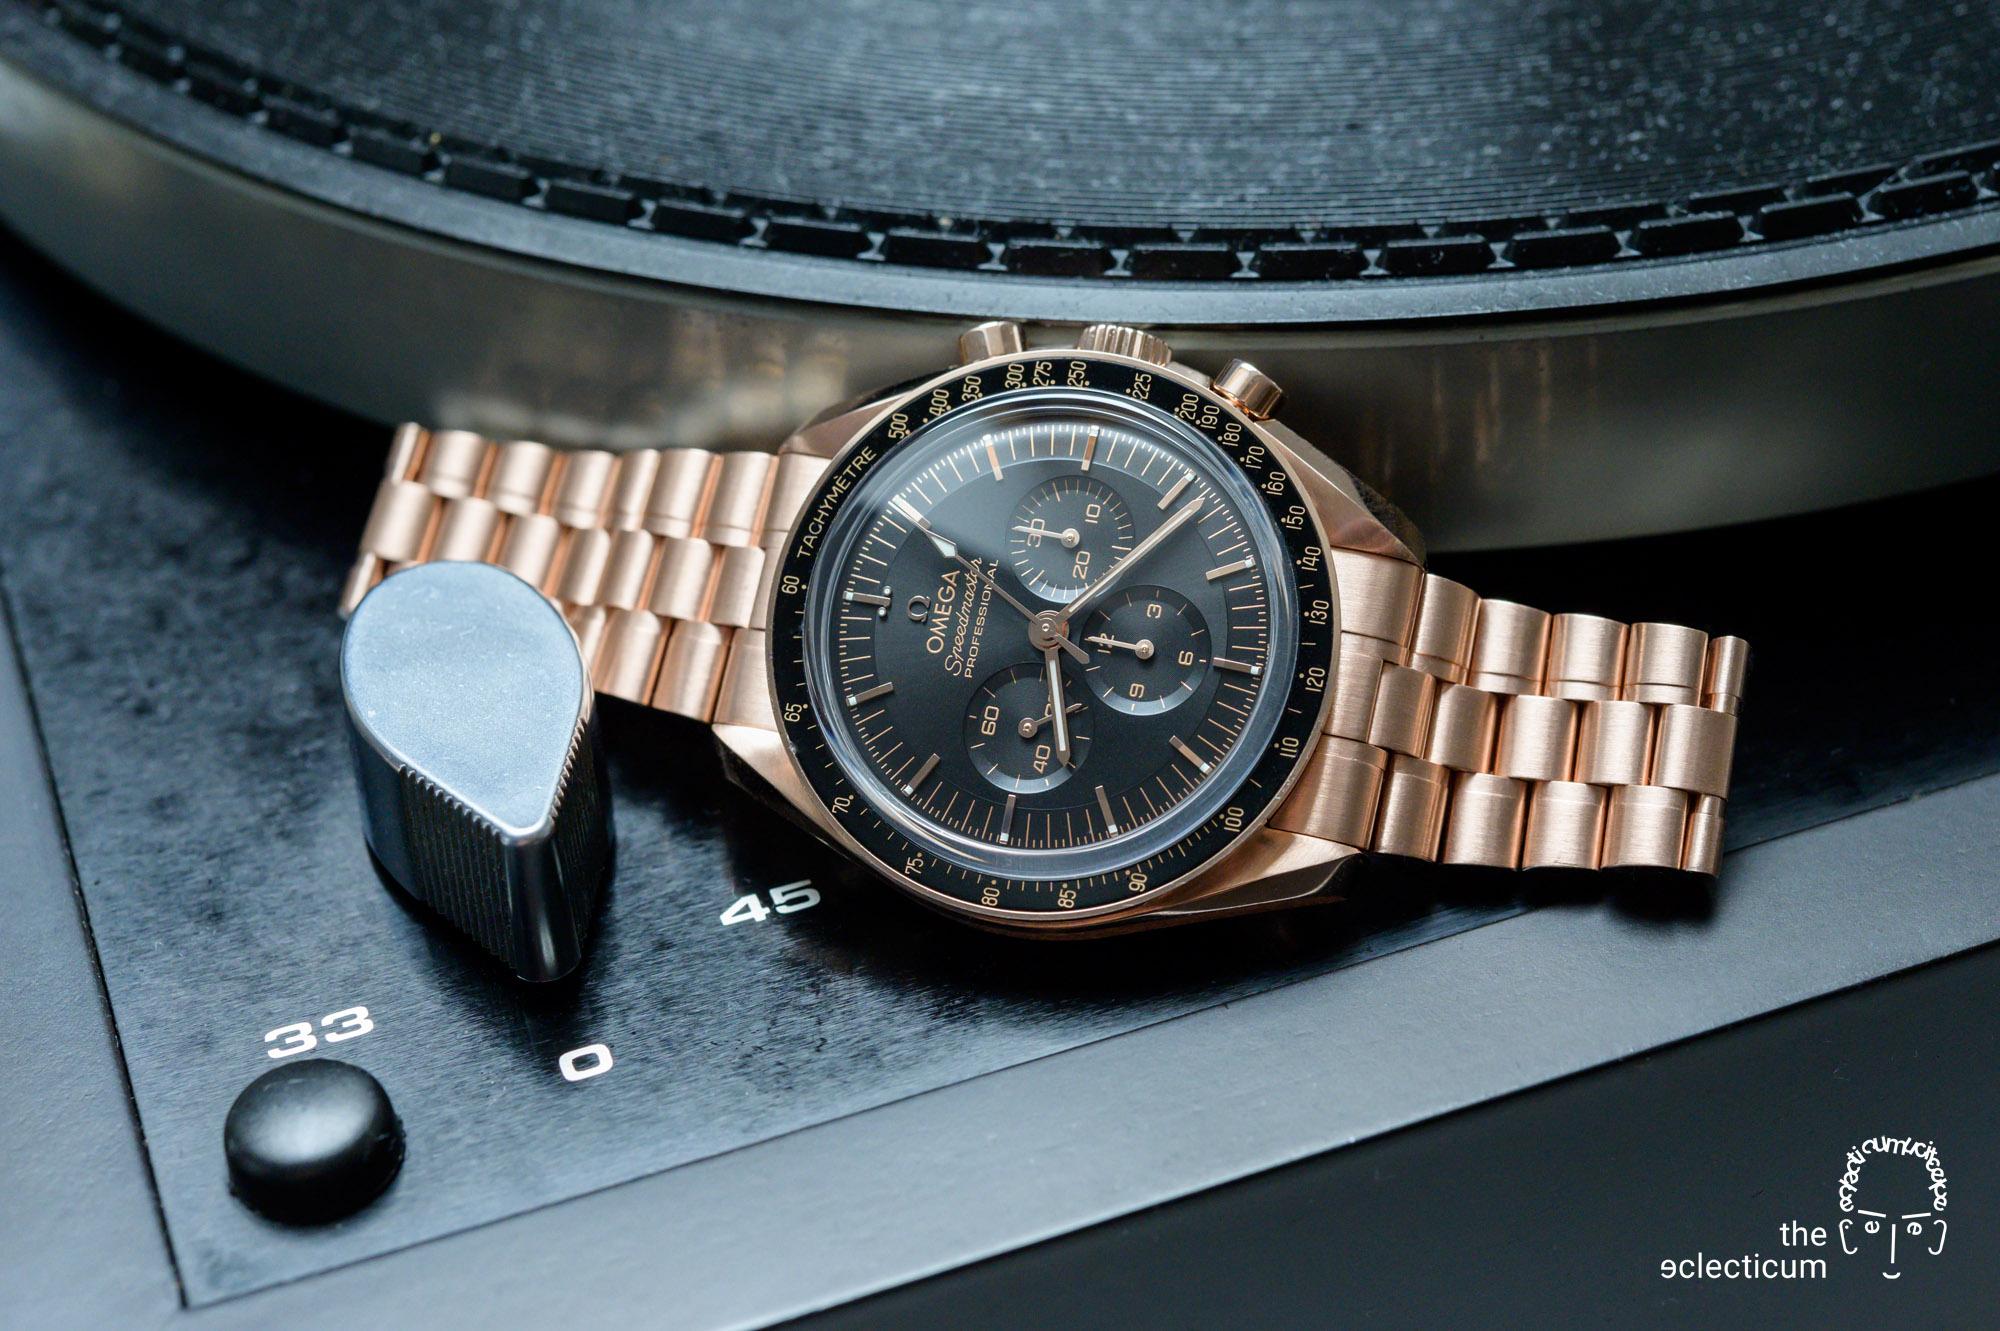 Omega Speedmaster Moonwatch Cal. 3861 Thorens record player